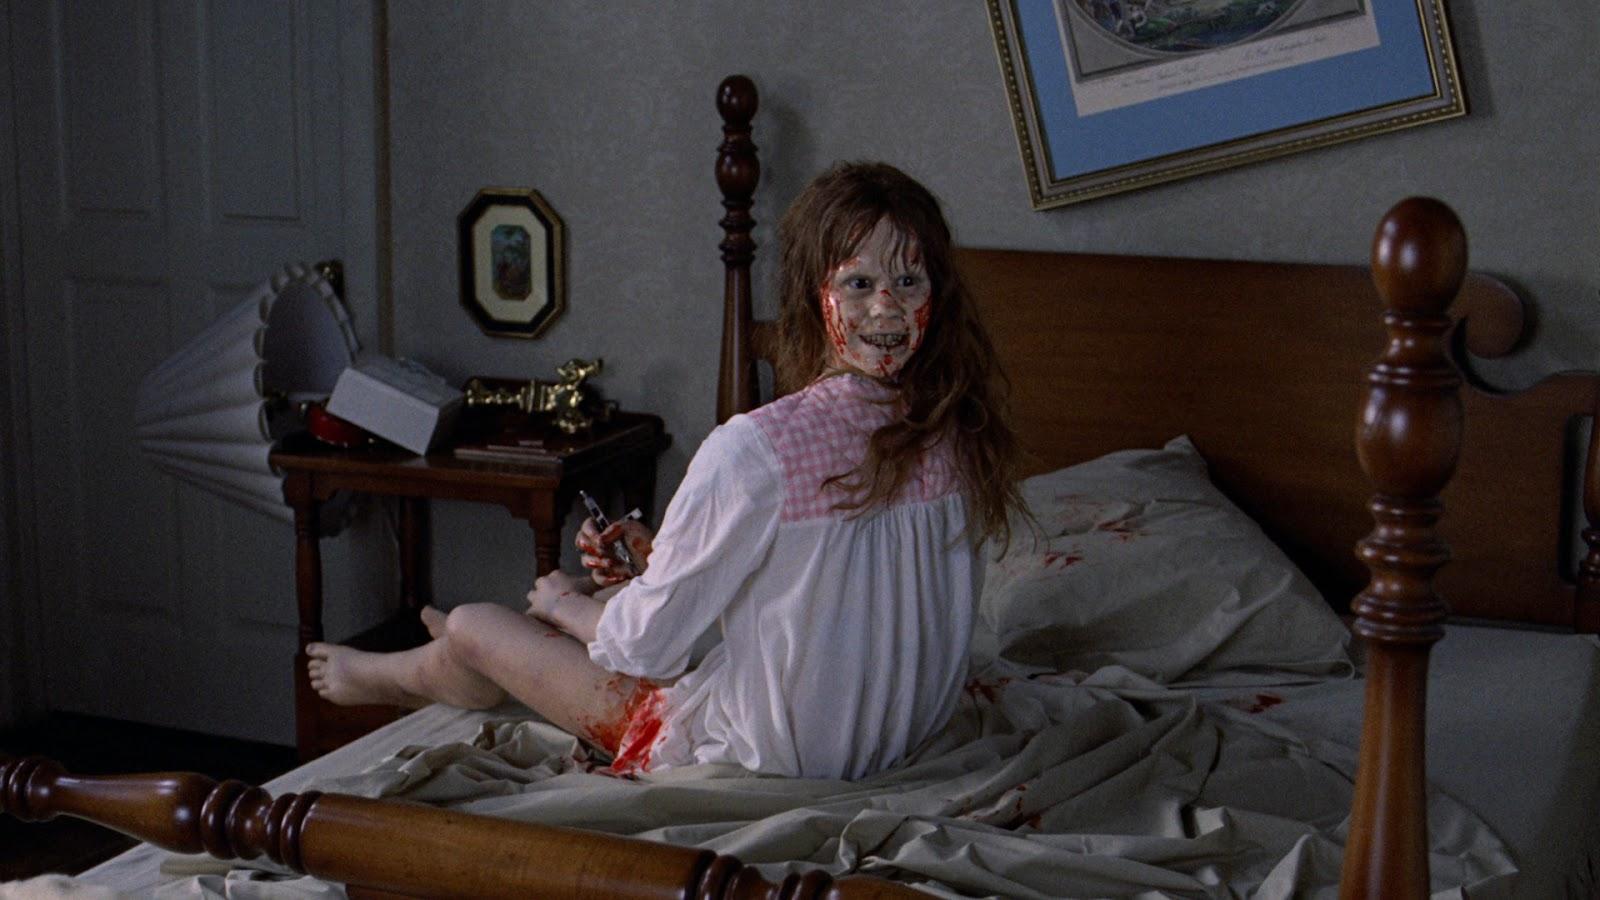 The Exorcist 2HERO MAGAZINE WEEKEND COMBO HALLOWEEN EXCORSIST MUSIC EAT LONDON DEATH JAKE GYLENHALL DONNIE DARKO ART HOGARTH